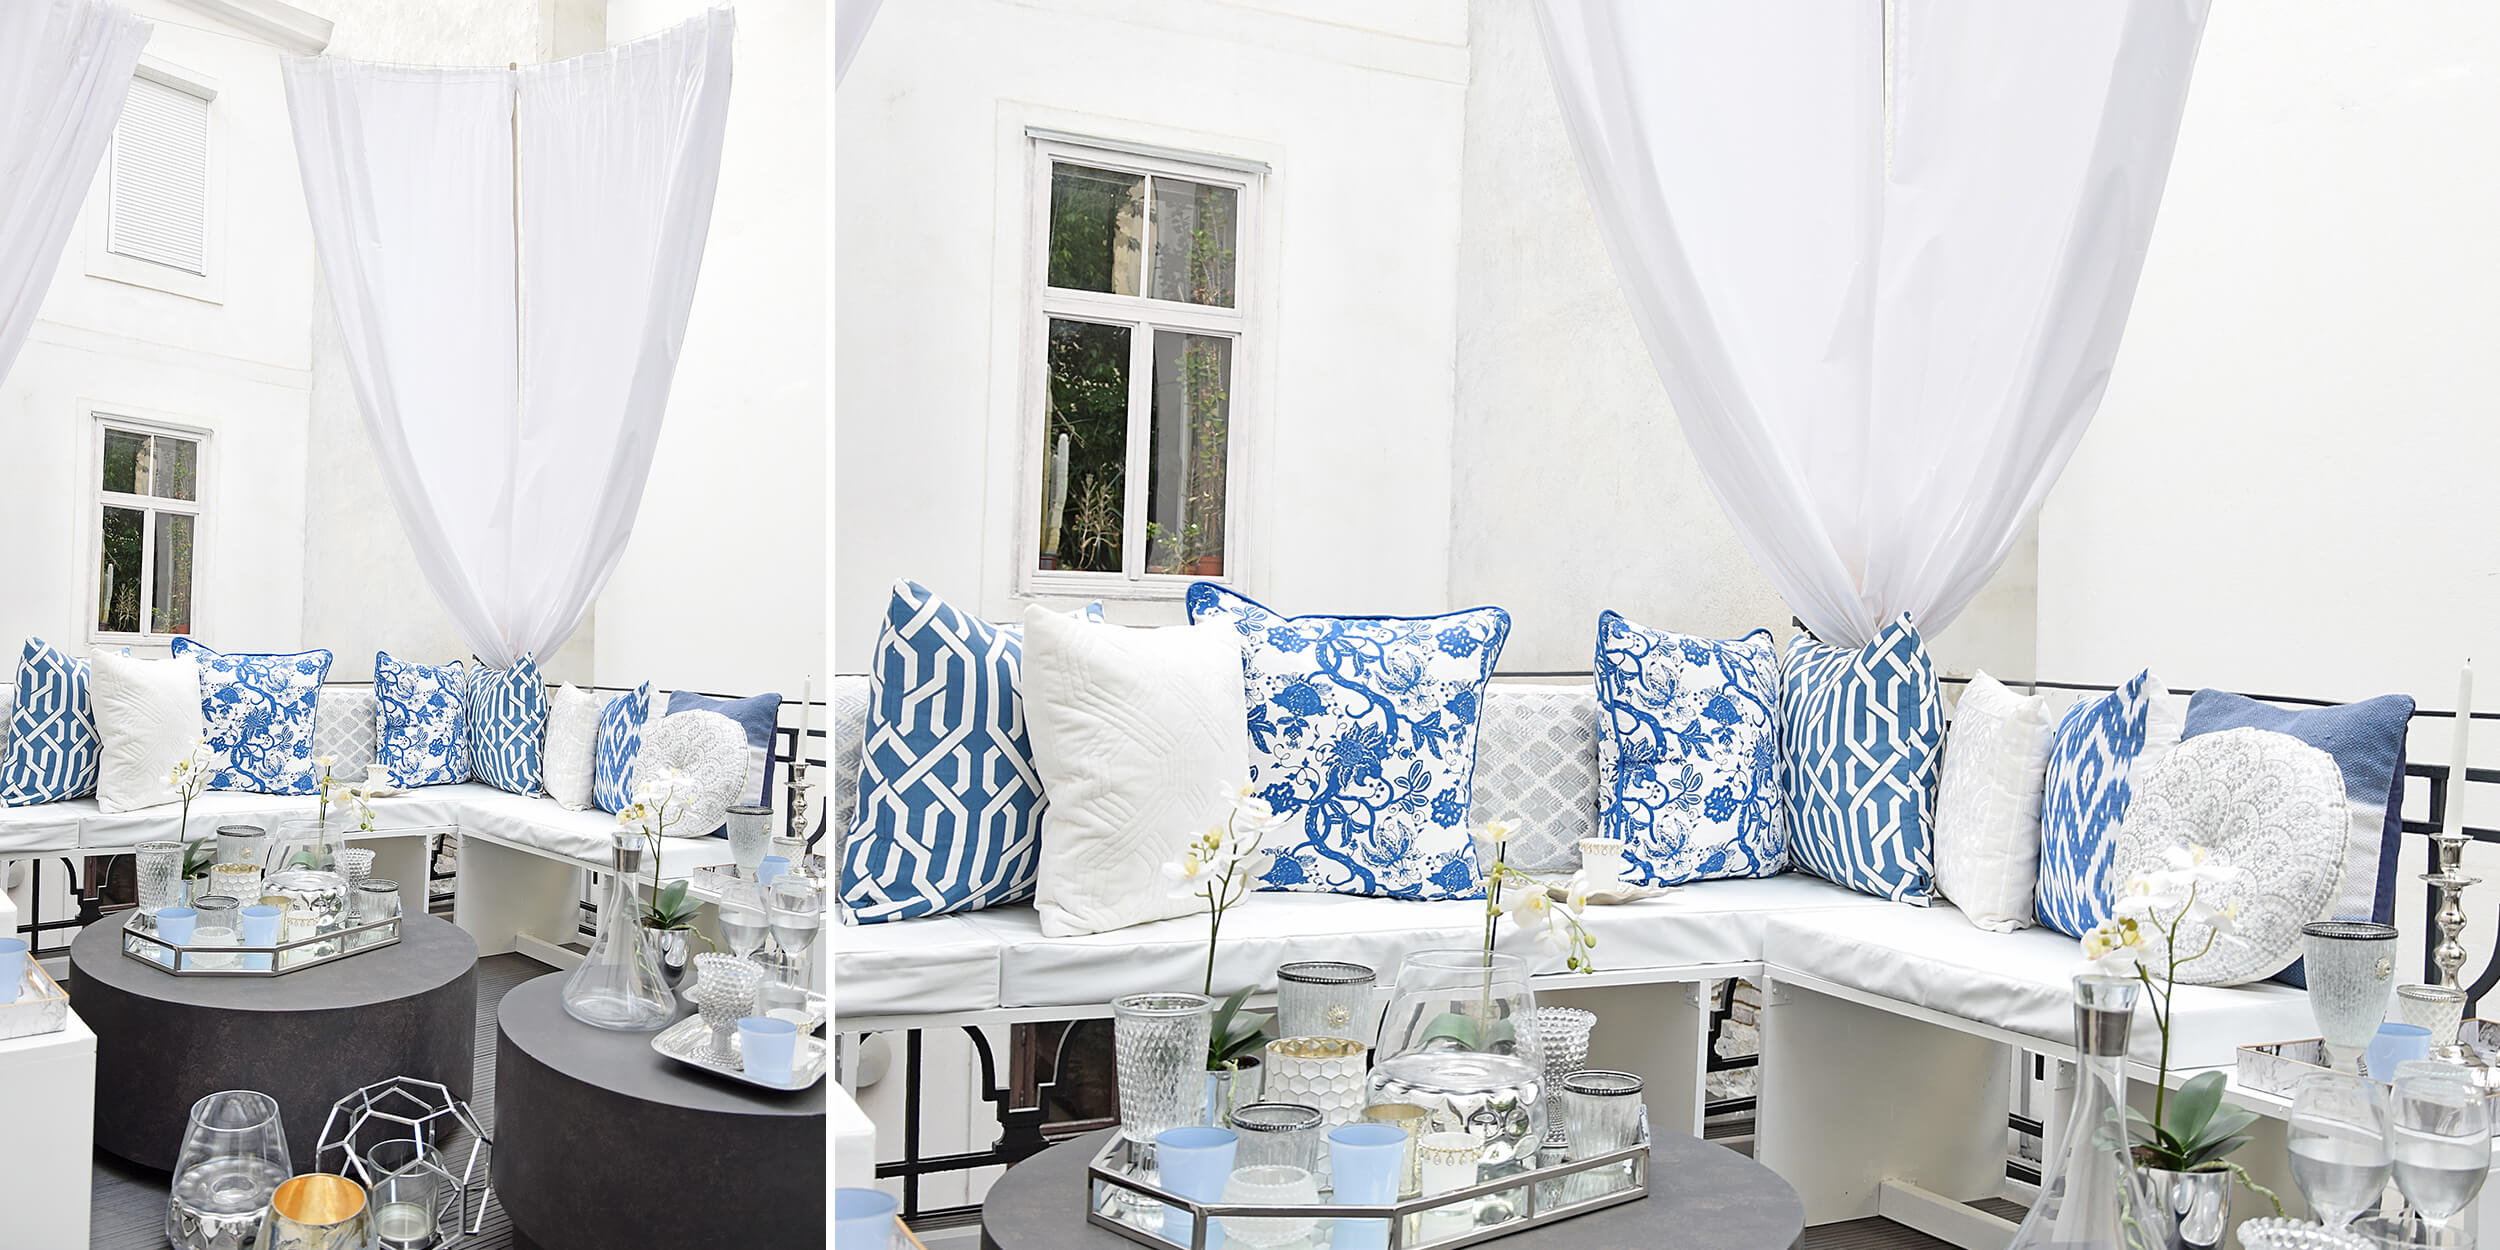 Farb-Mix Weiß, Blau, & Silber